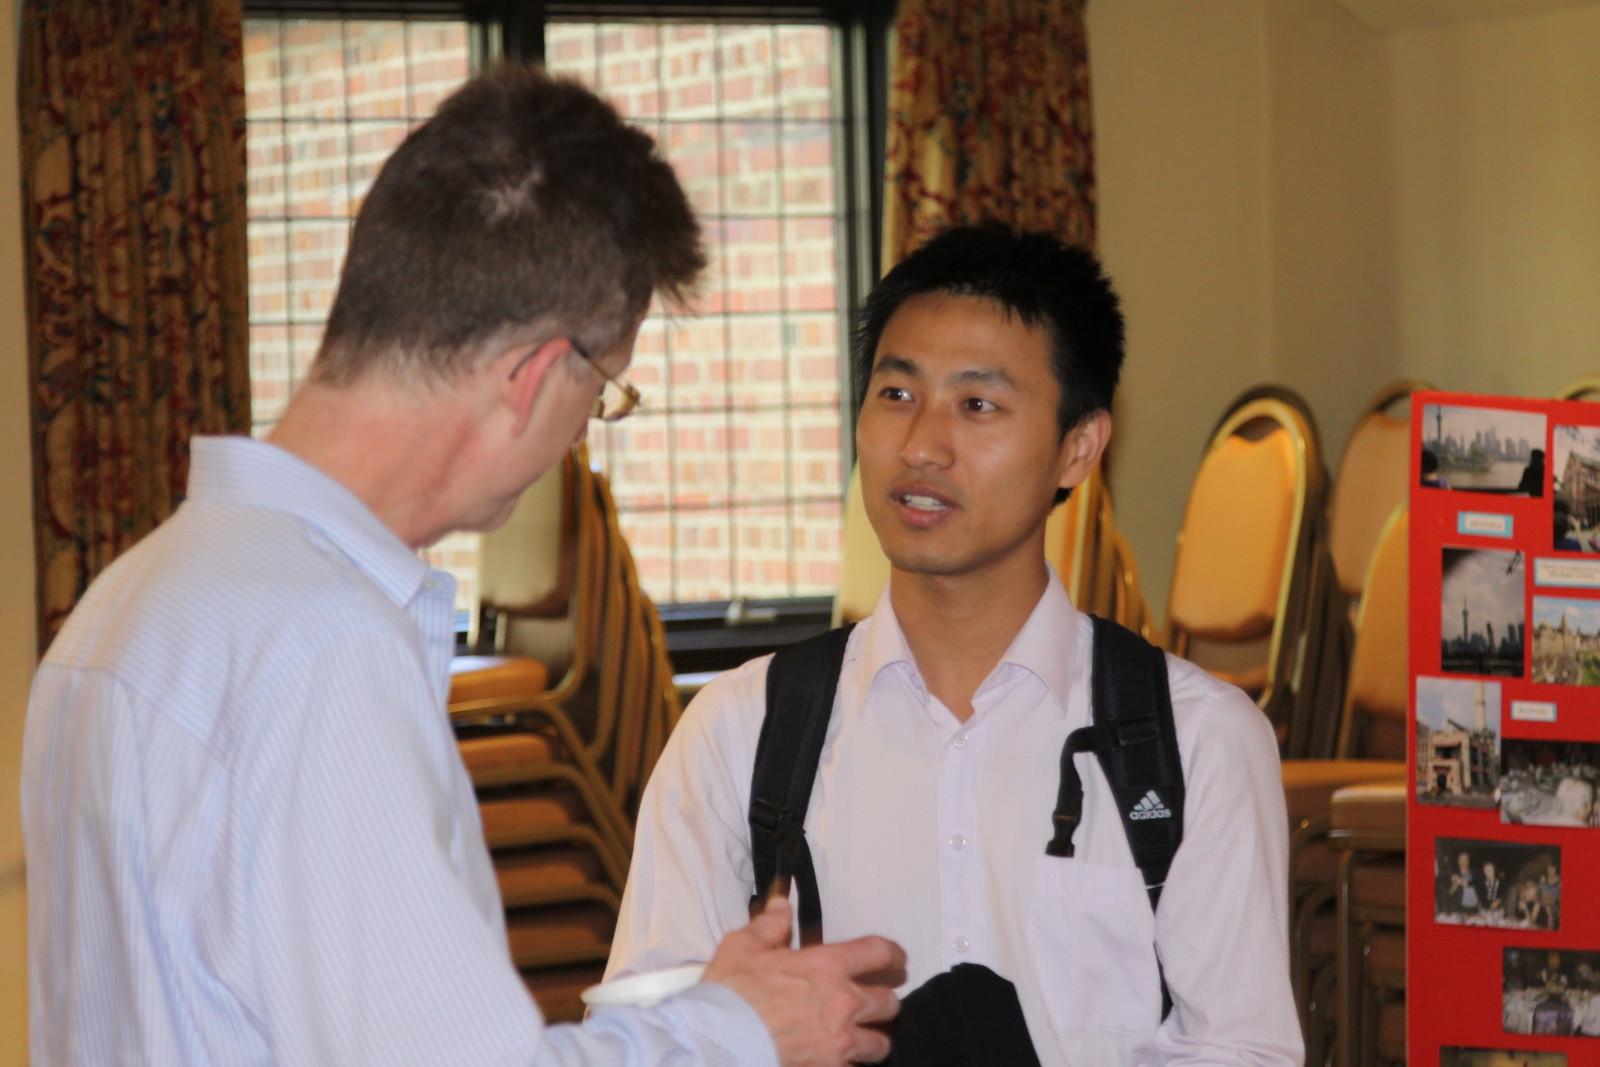 Wang Bin with Ken McFayden from Union Seminary